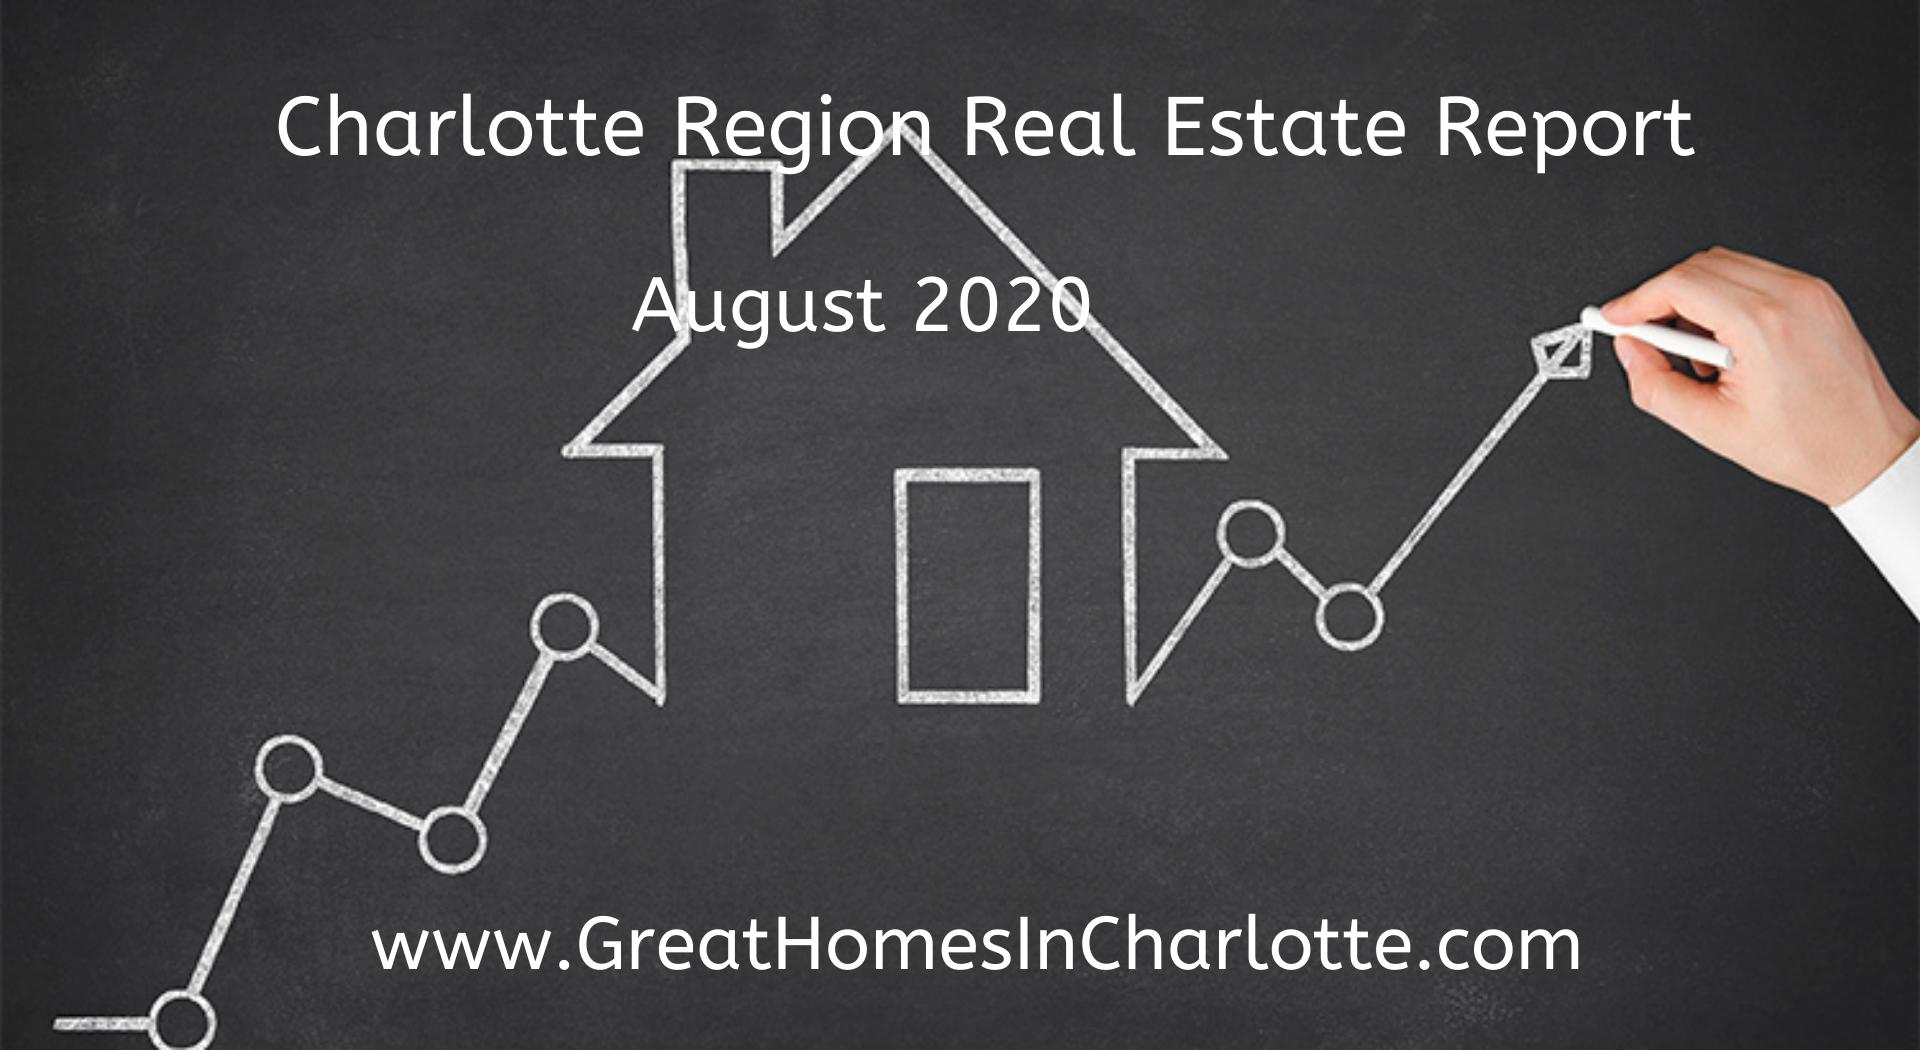 Charlotte Region Real Estate Report: August 2020